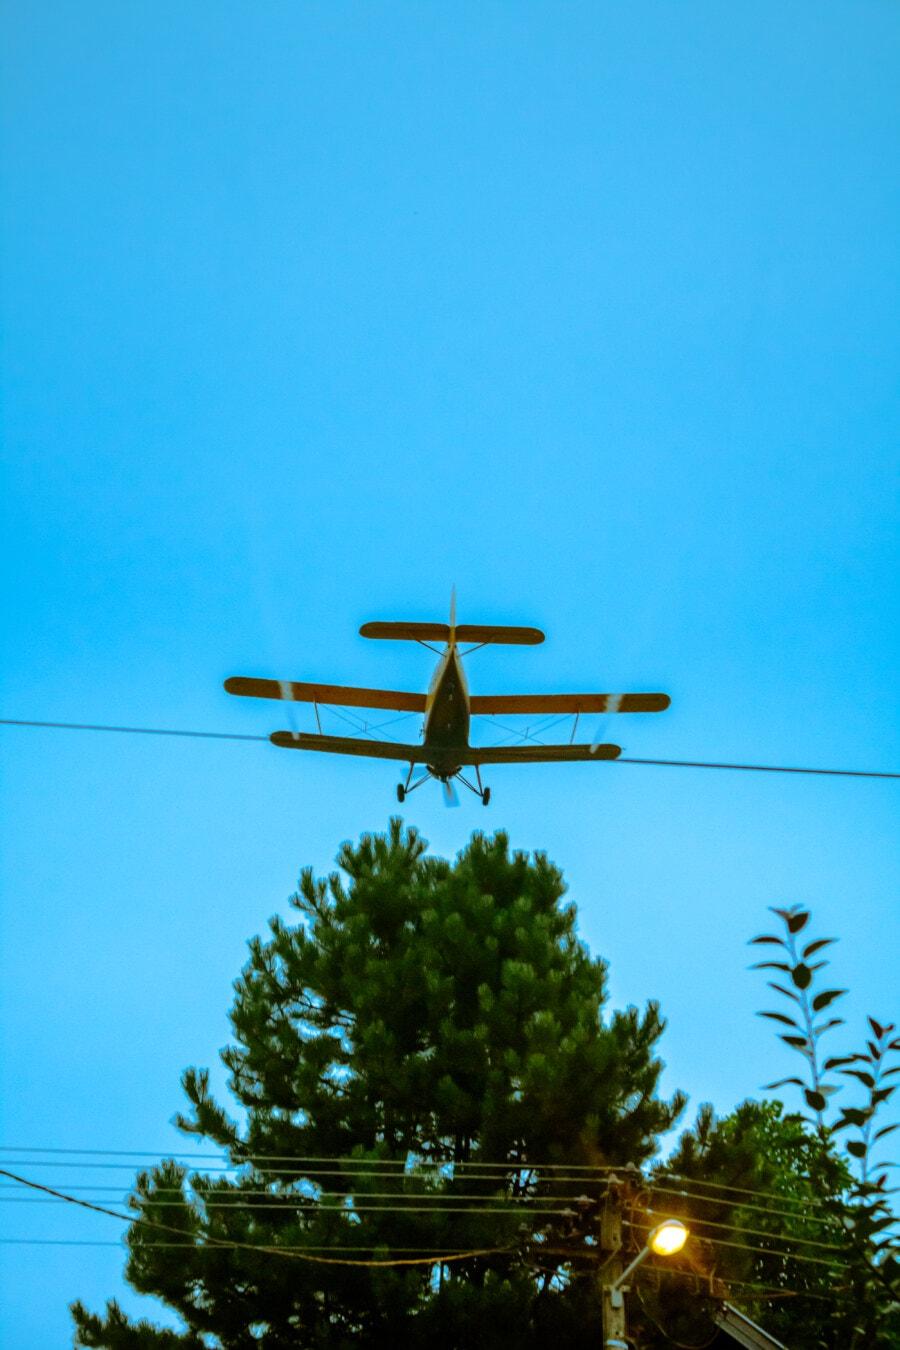 aerodynamic, biplane, aircraft, wings, blue sky, flight, plane, flying, jet, airplane